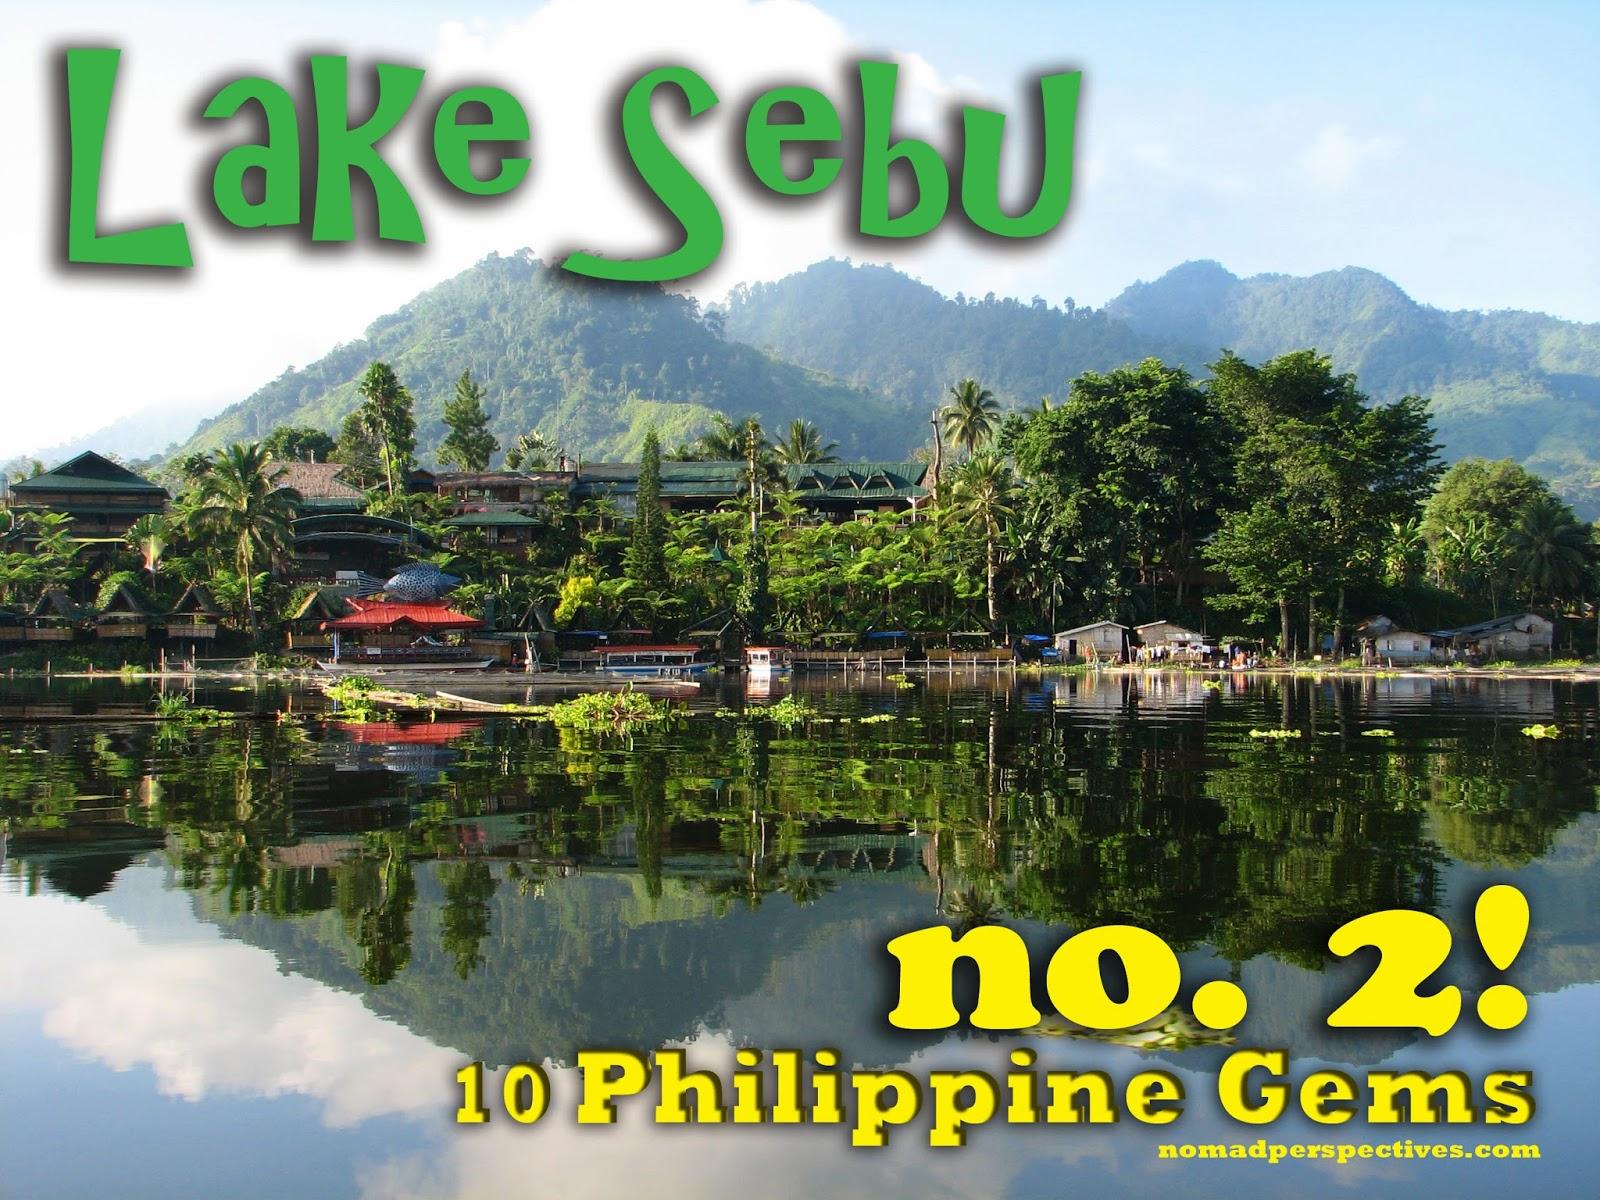 Lake sebu on top 10 tourism gems in the philippines a nomads lake sebu on top 10 tourism gems in the philippines a nomads perspectives thecheapjerseys Gallery